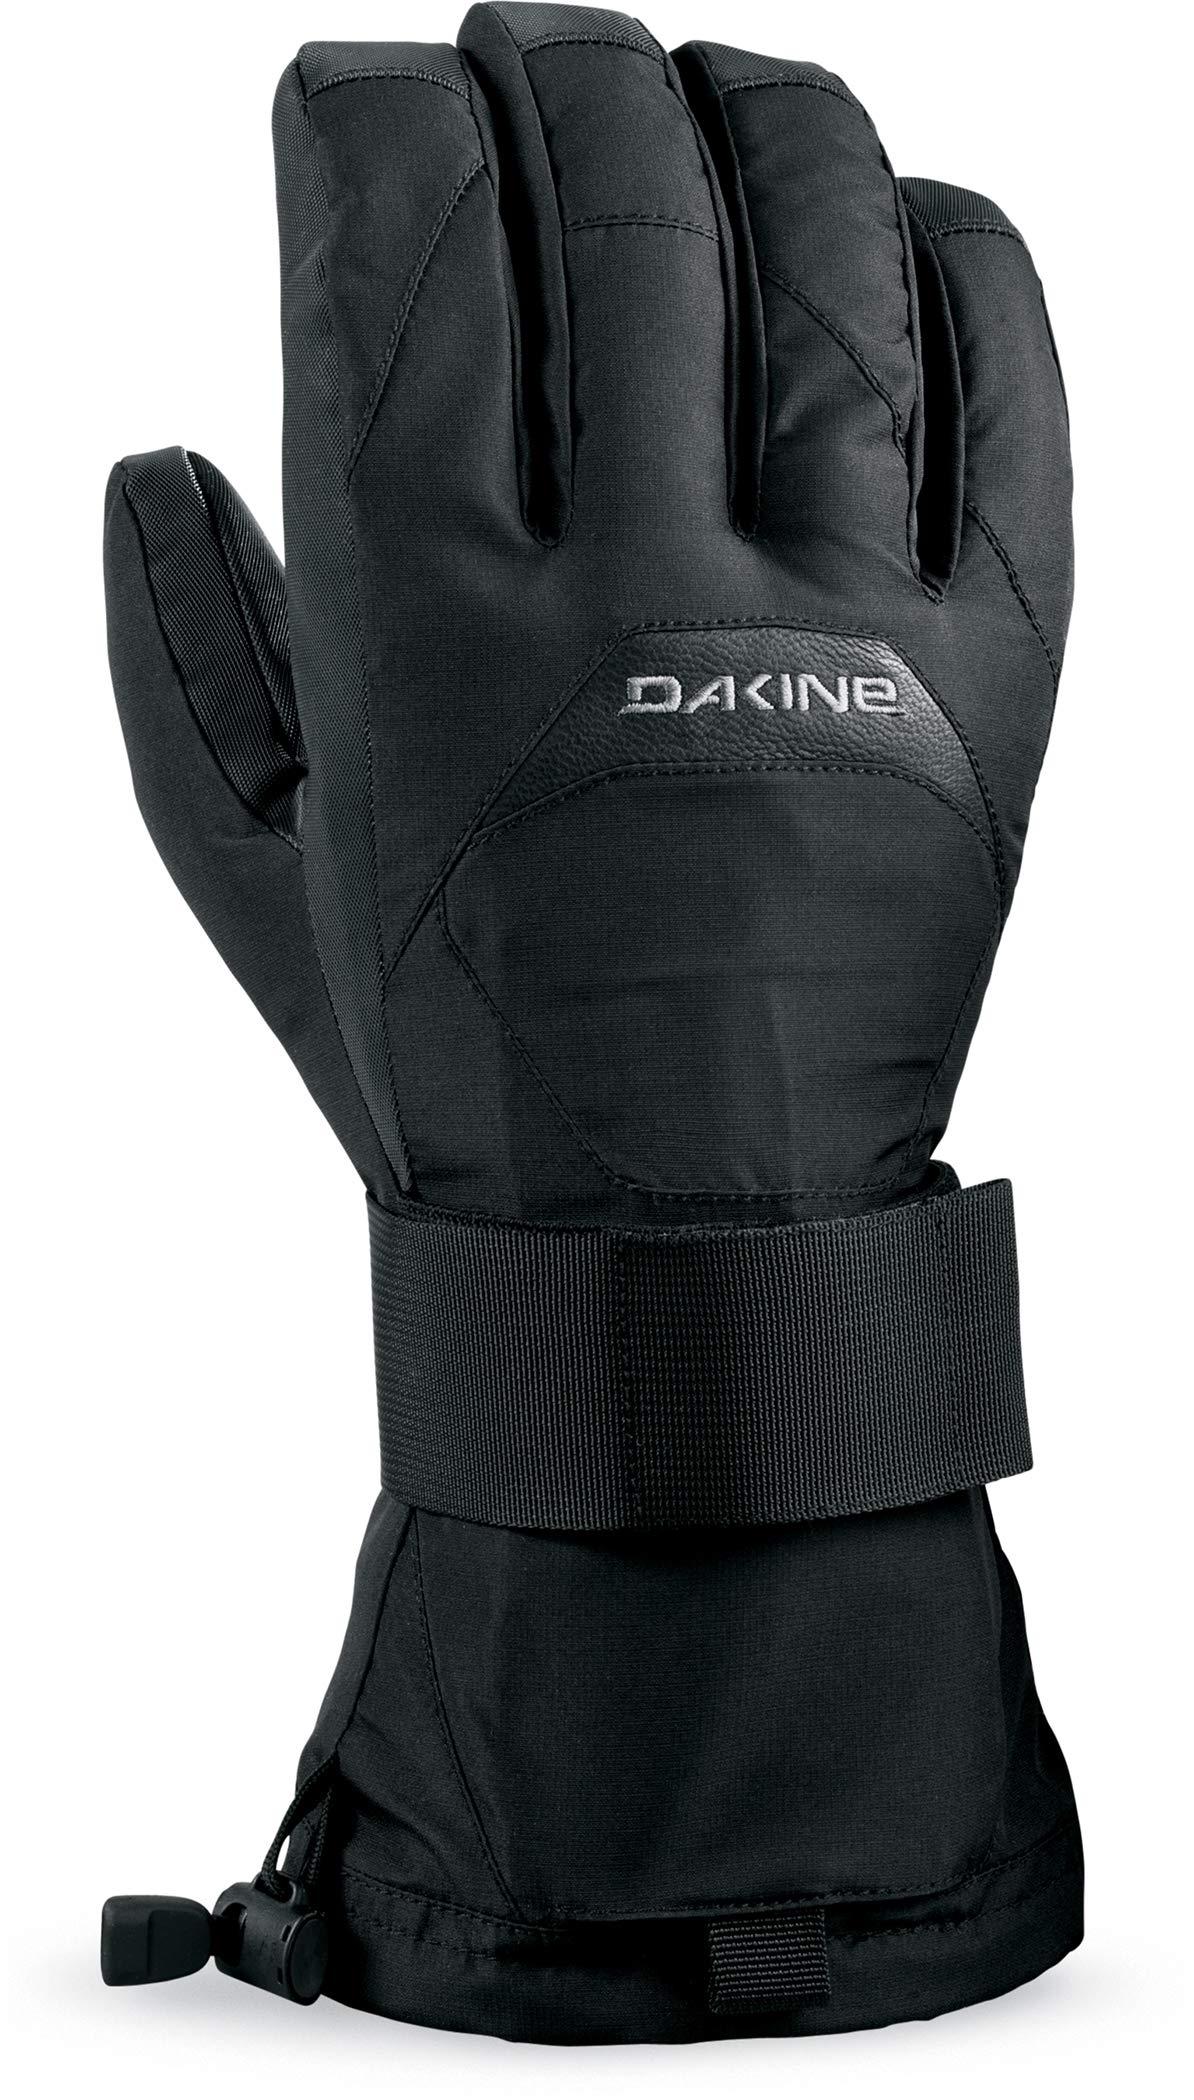 Dakine Herren Handschuhe Wristguard Gloves, Black, XL